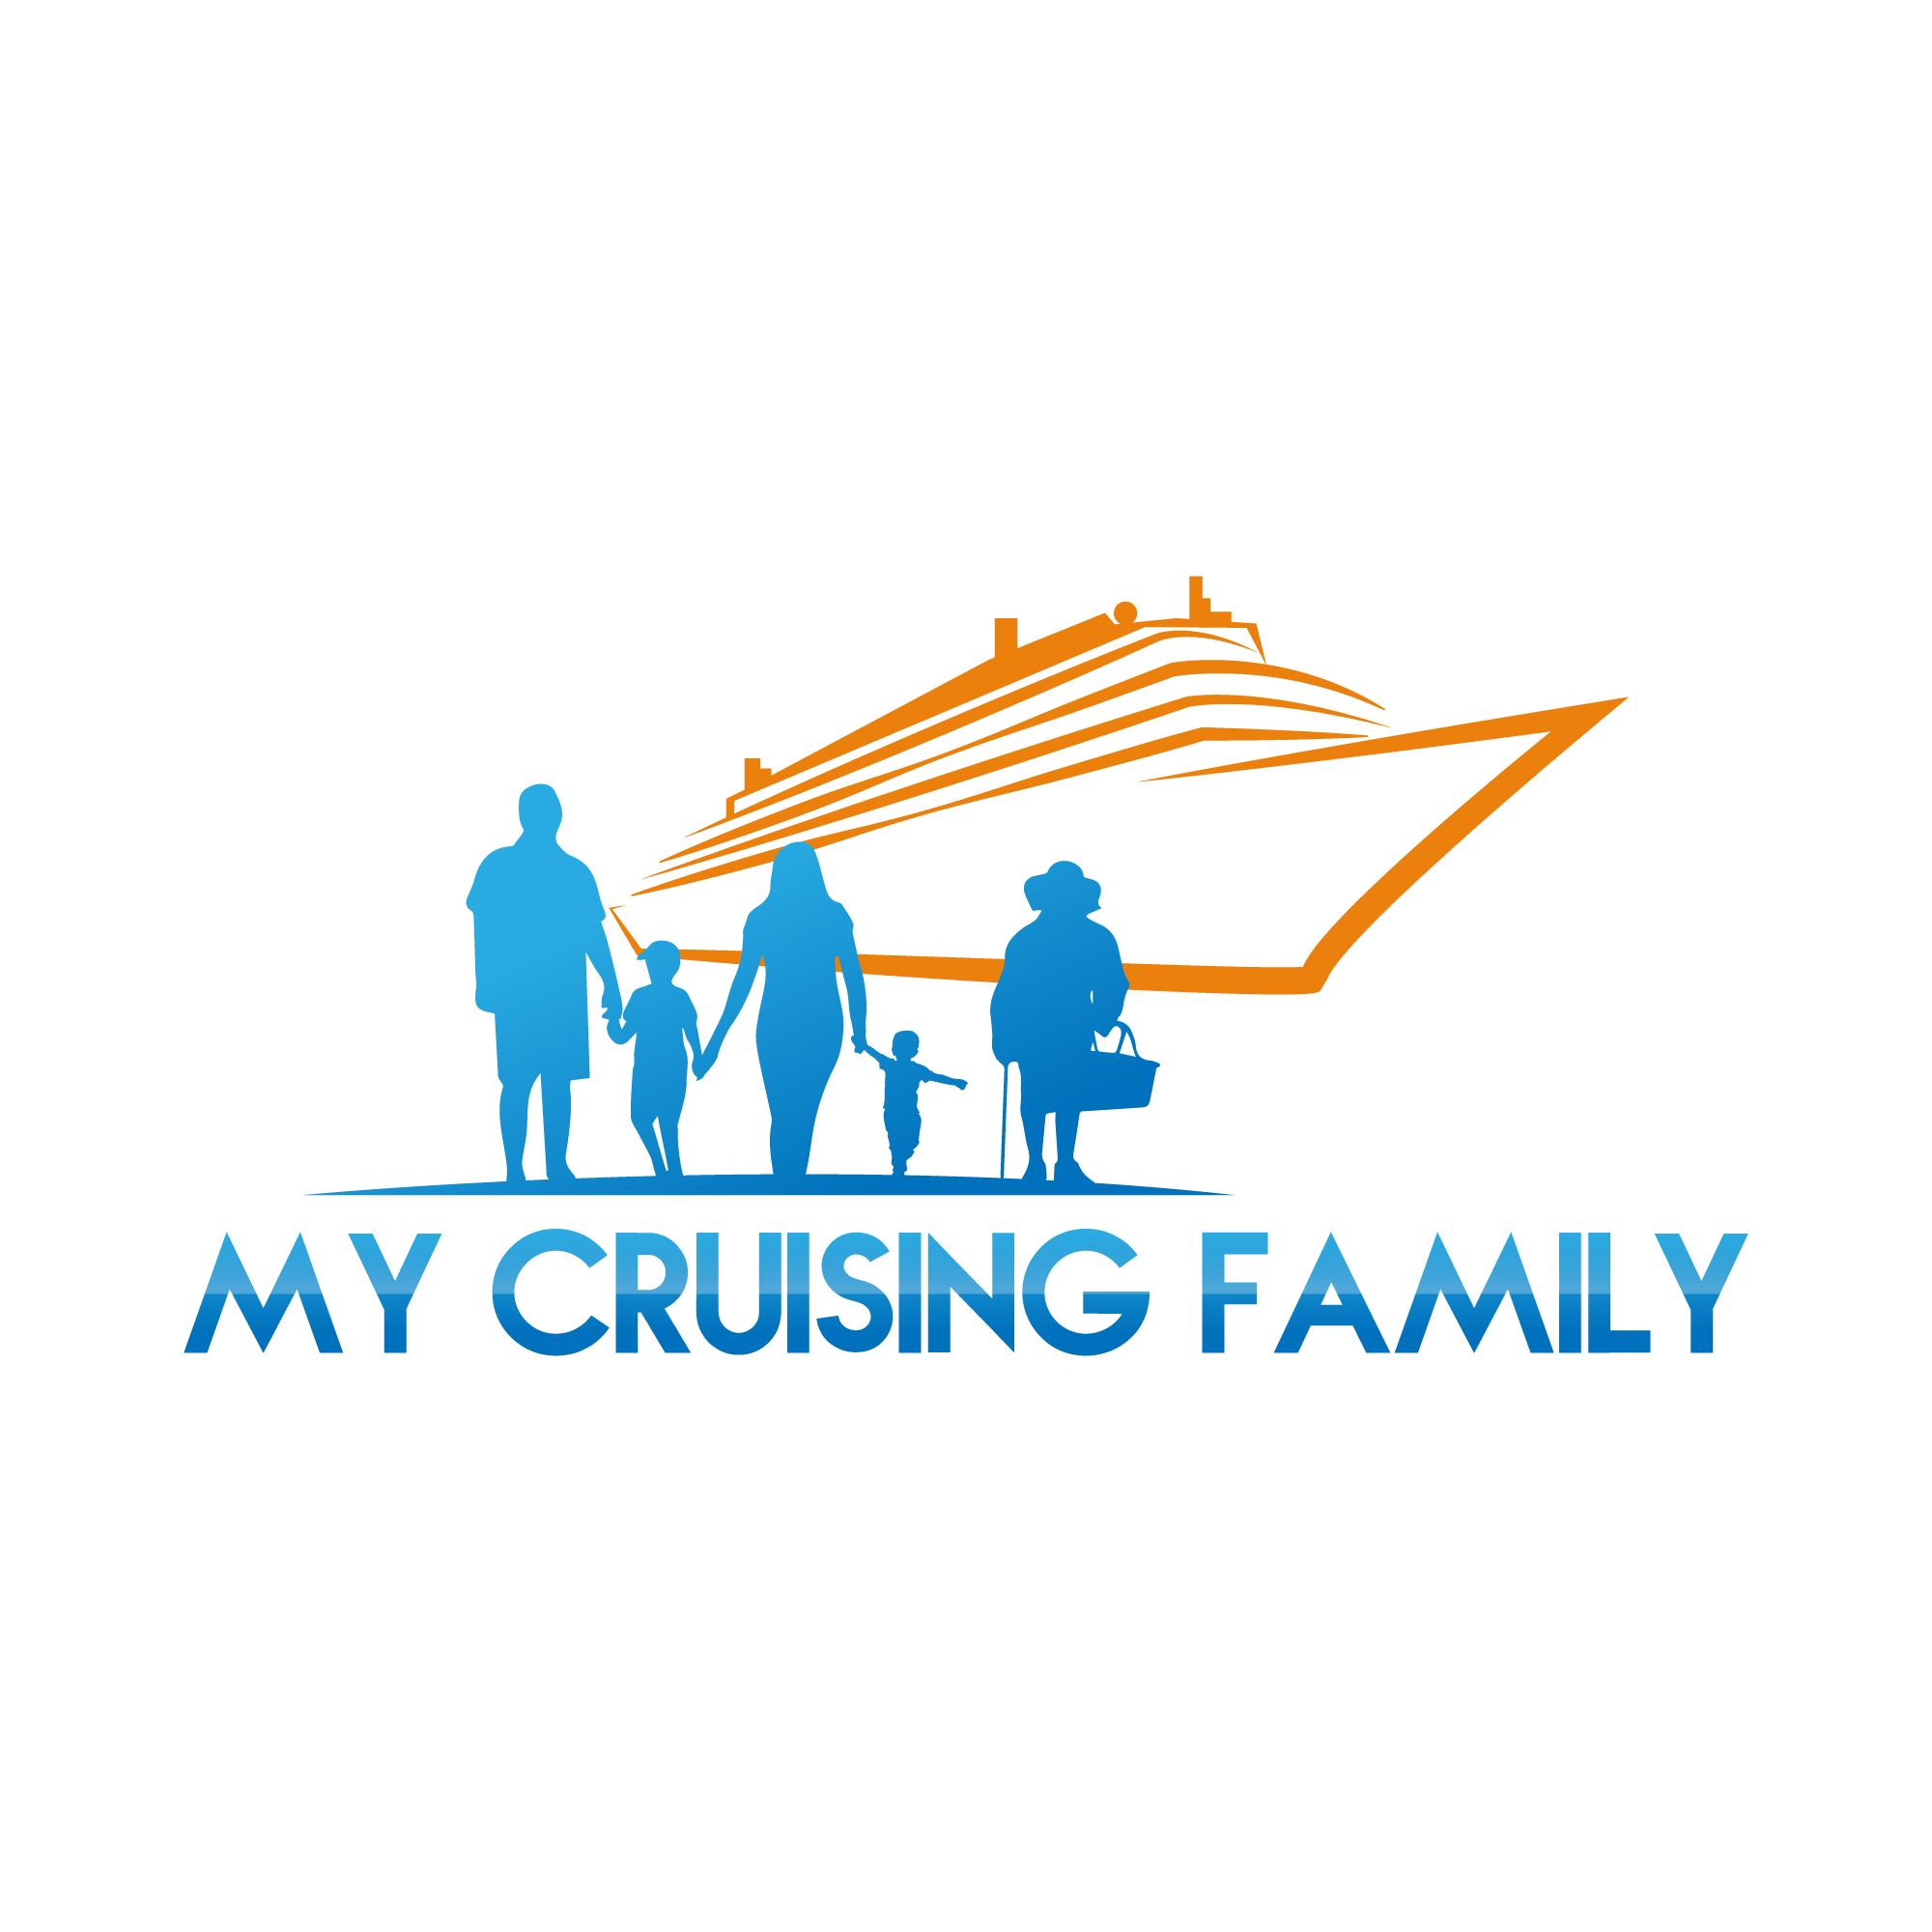 MyCruisingFamilyLogoA1.jpg